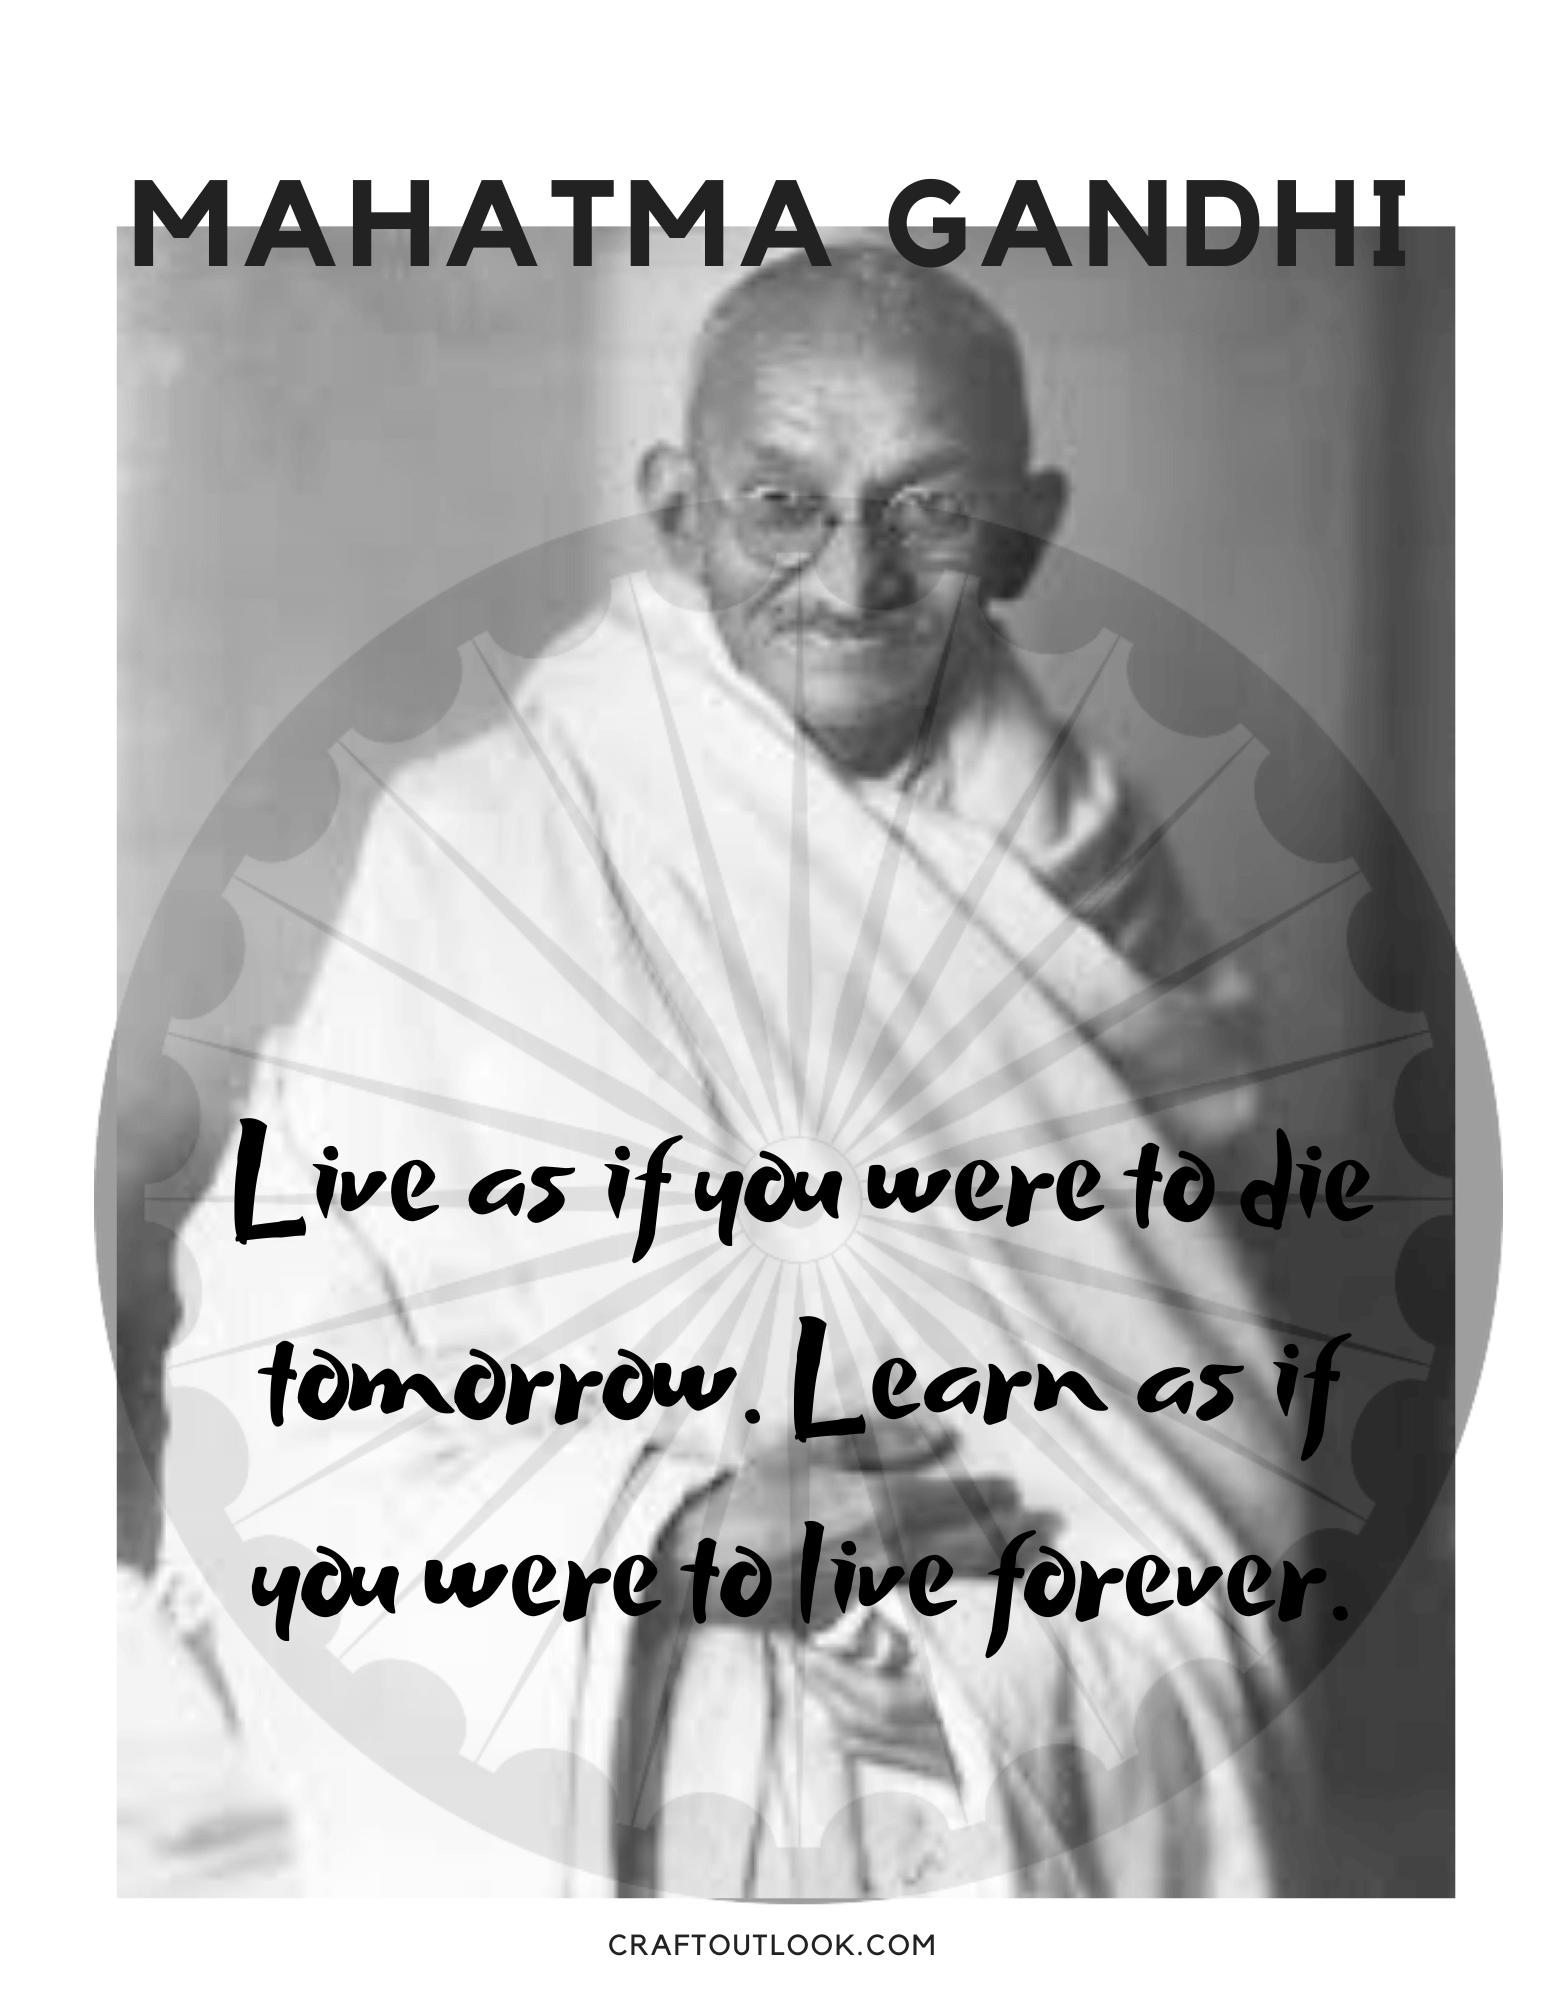 Mahatma Gandhi - craftoutlook.com